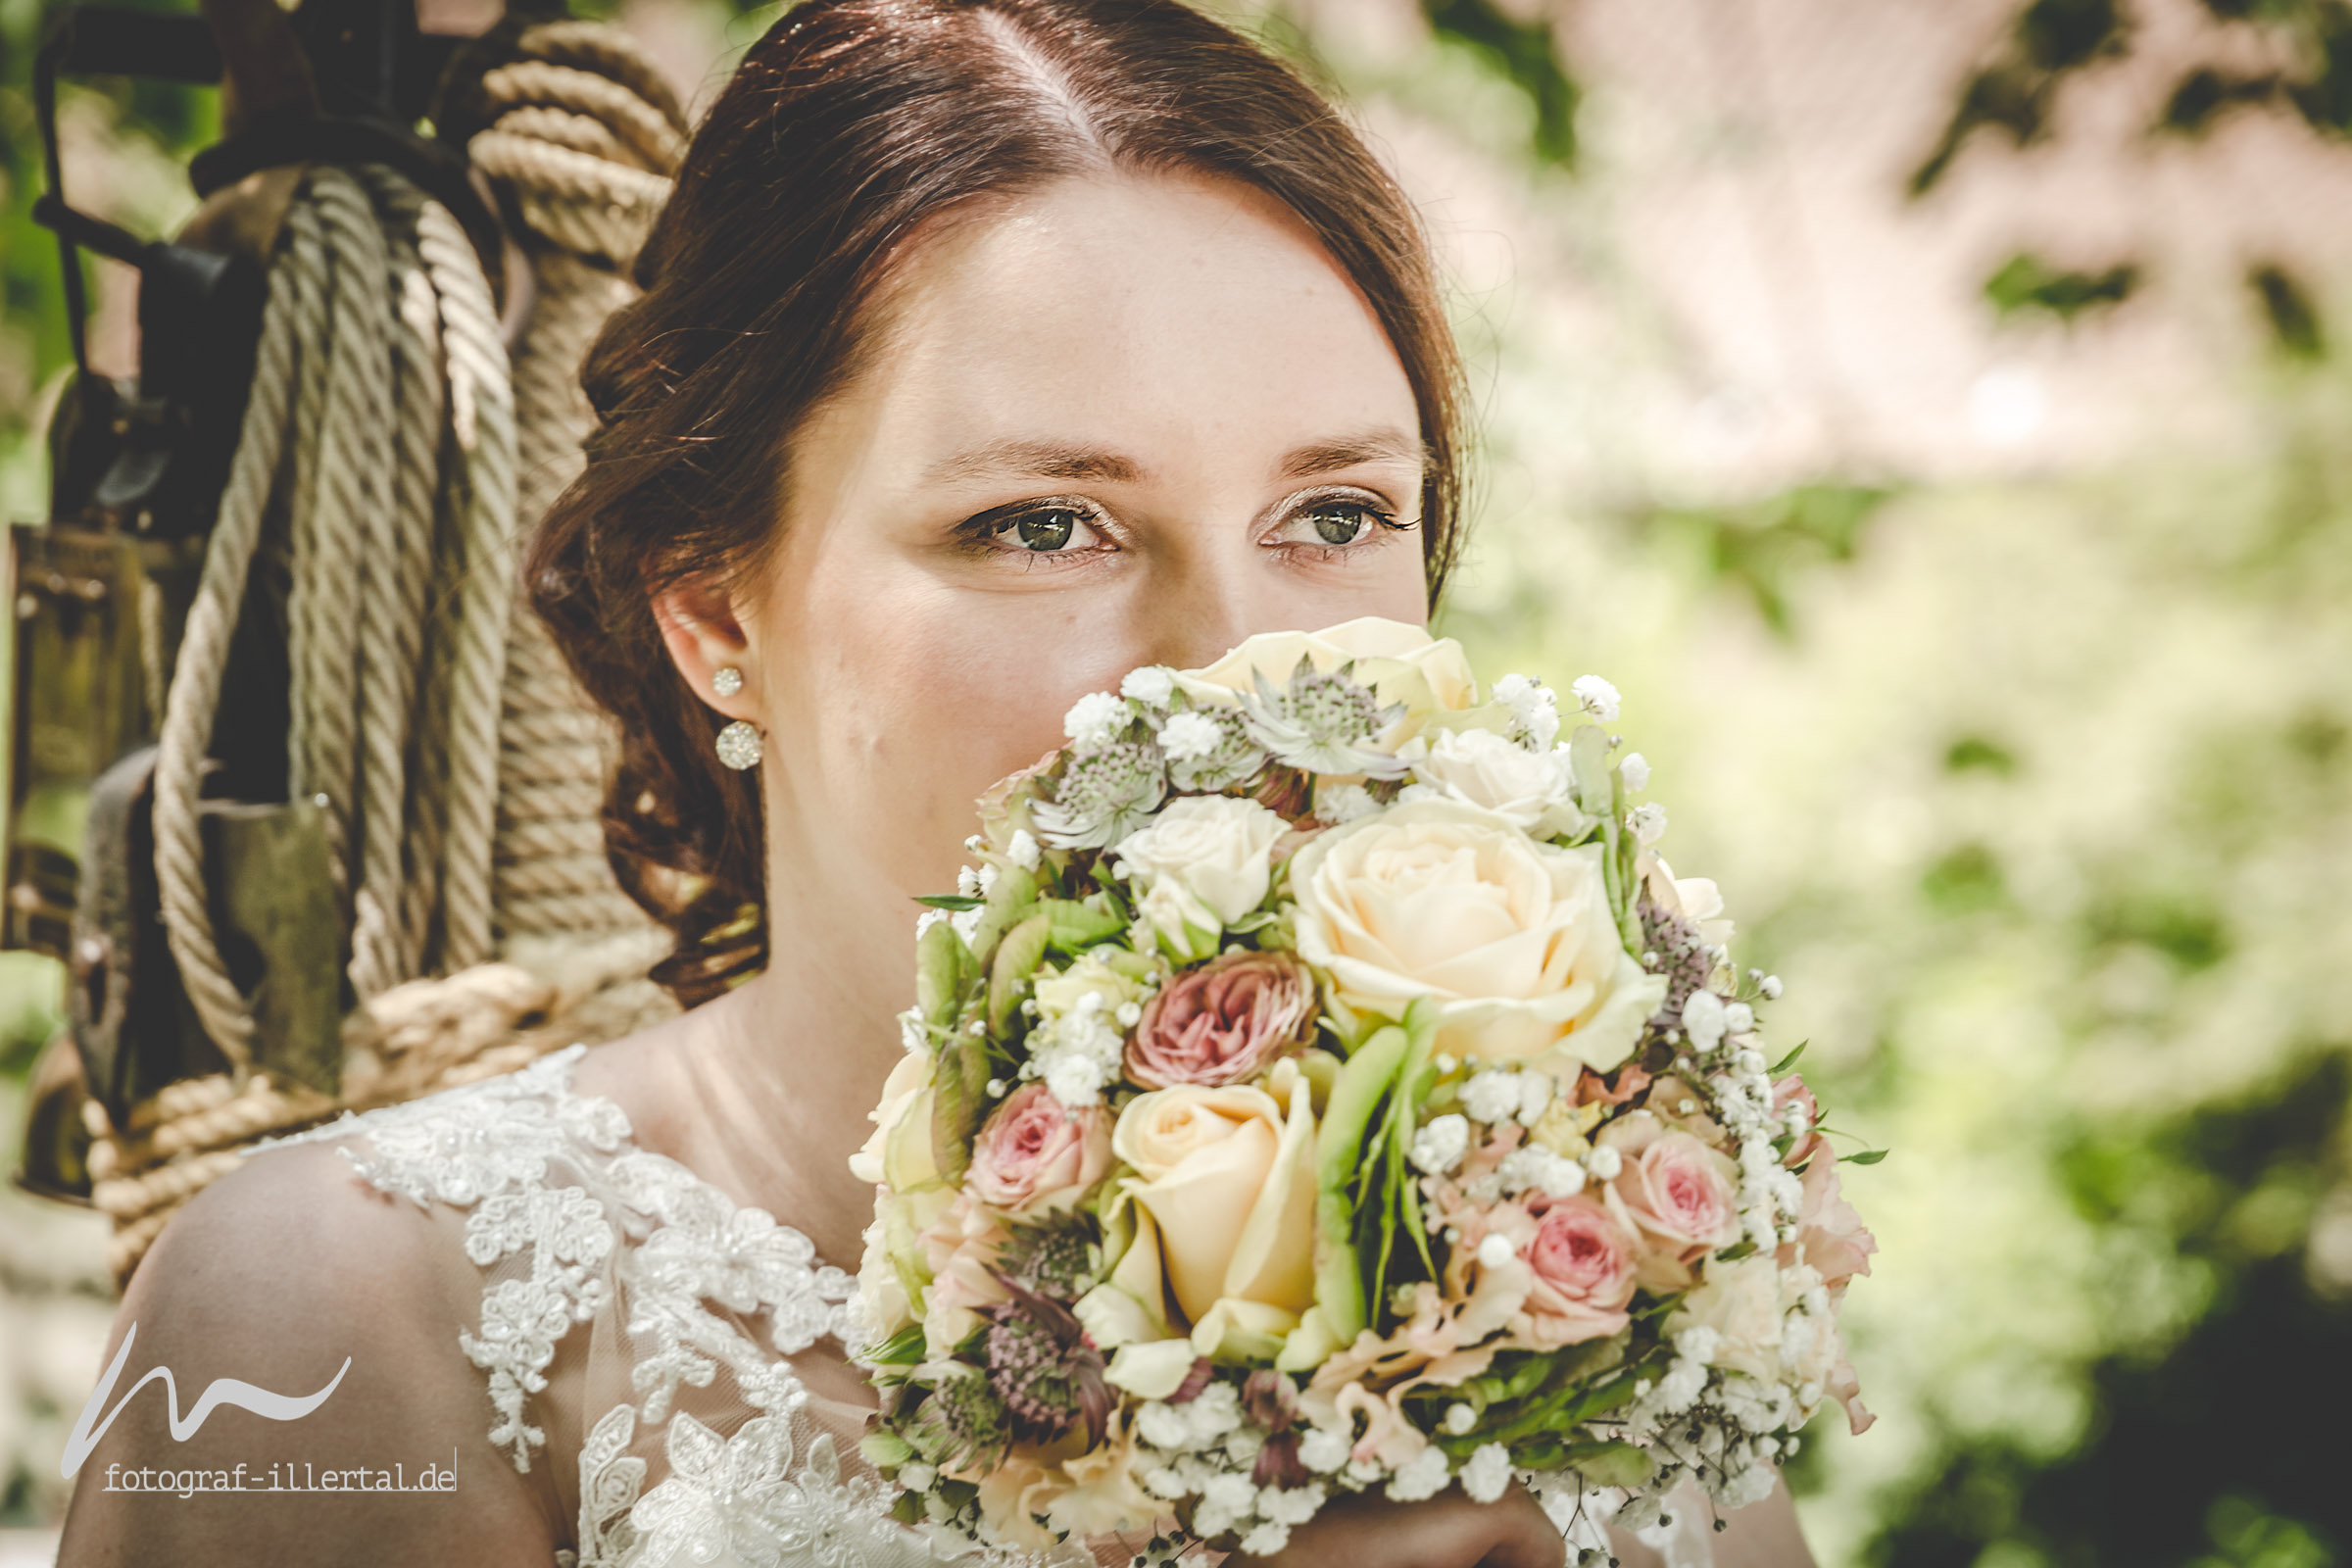 Fotograf Illertal-Christian Miller-Hochzeitsfotografie-_MG_5253